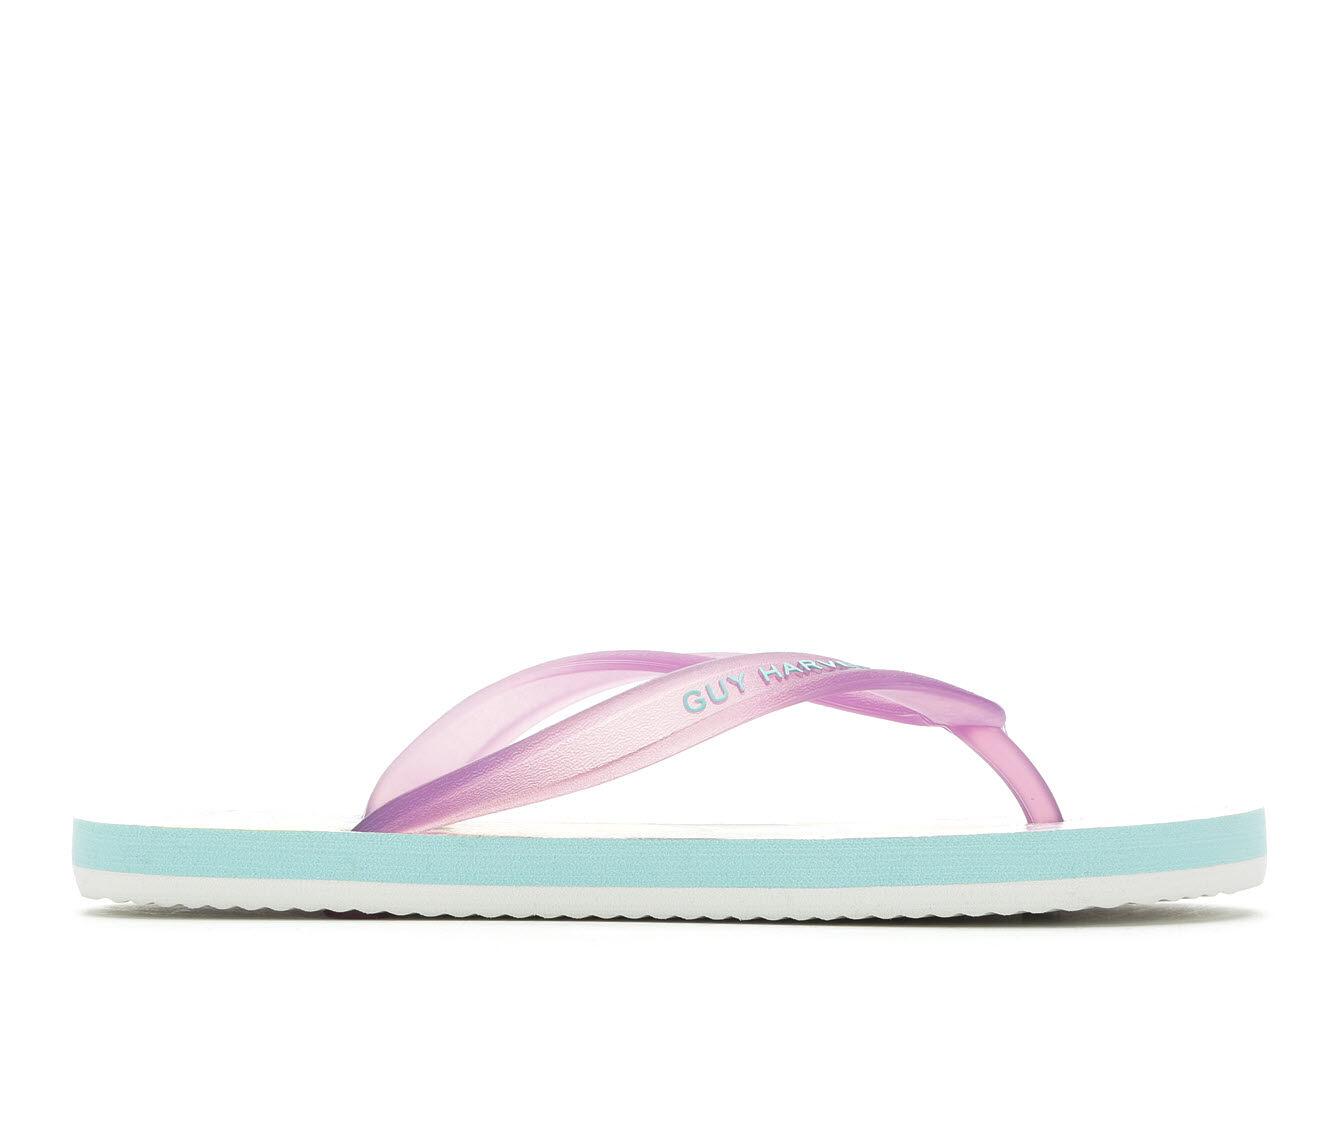 Women's Guy Harvey Cayman Angelfish Flip-Flops Purple/Aqua